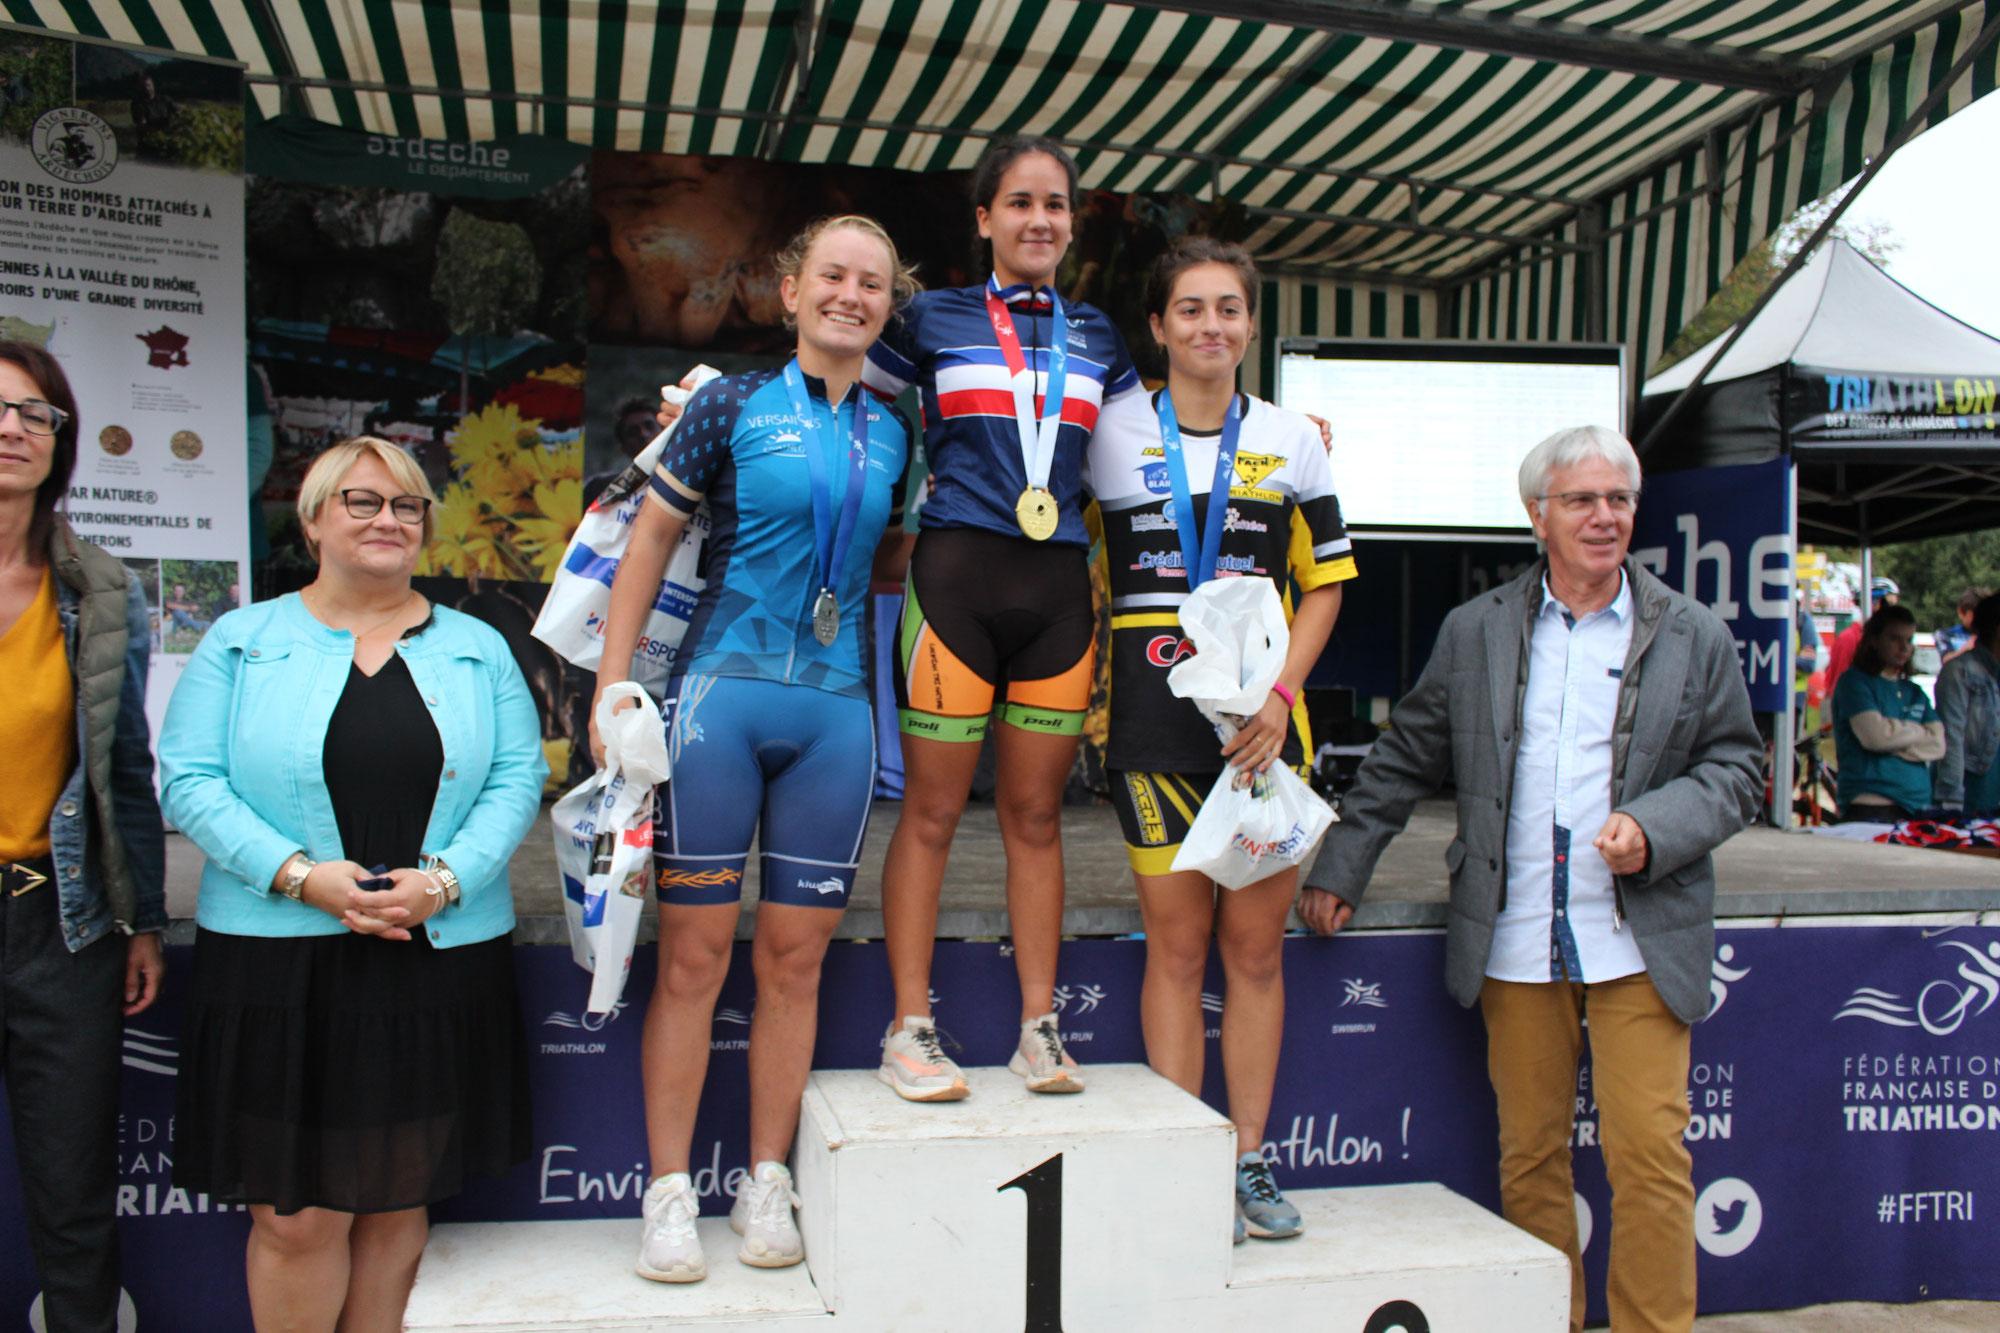 Solène SICK Championne de France junior de cross triathlon